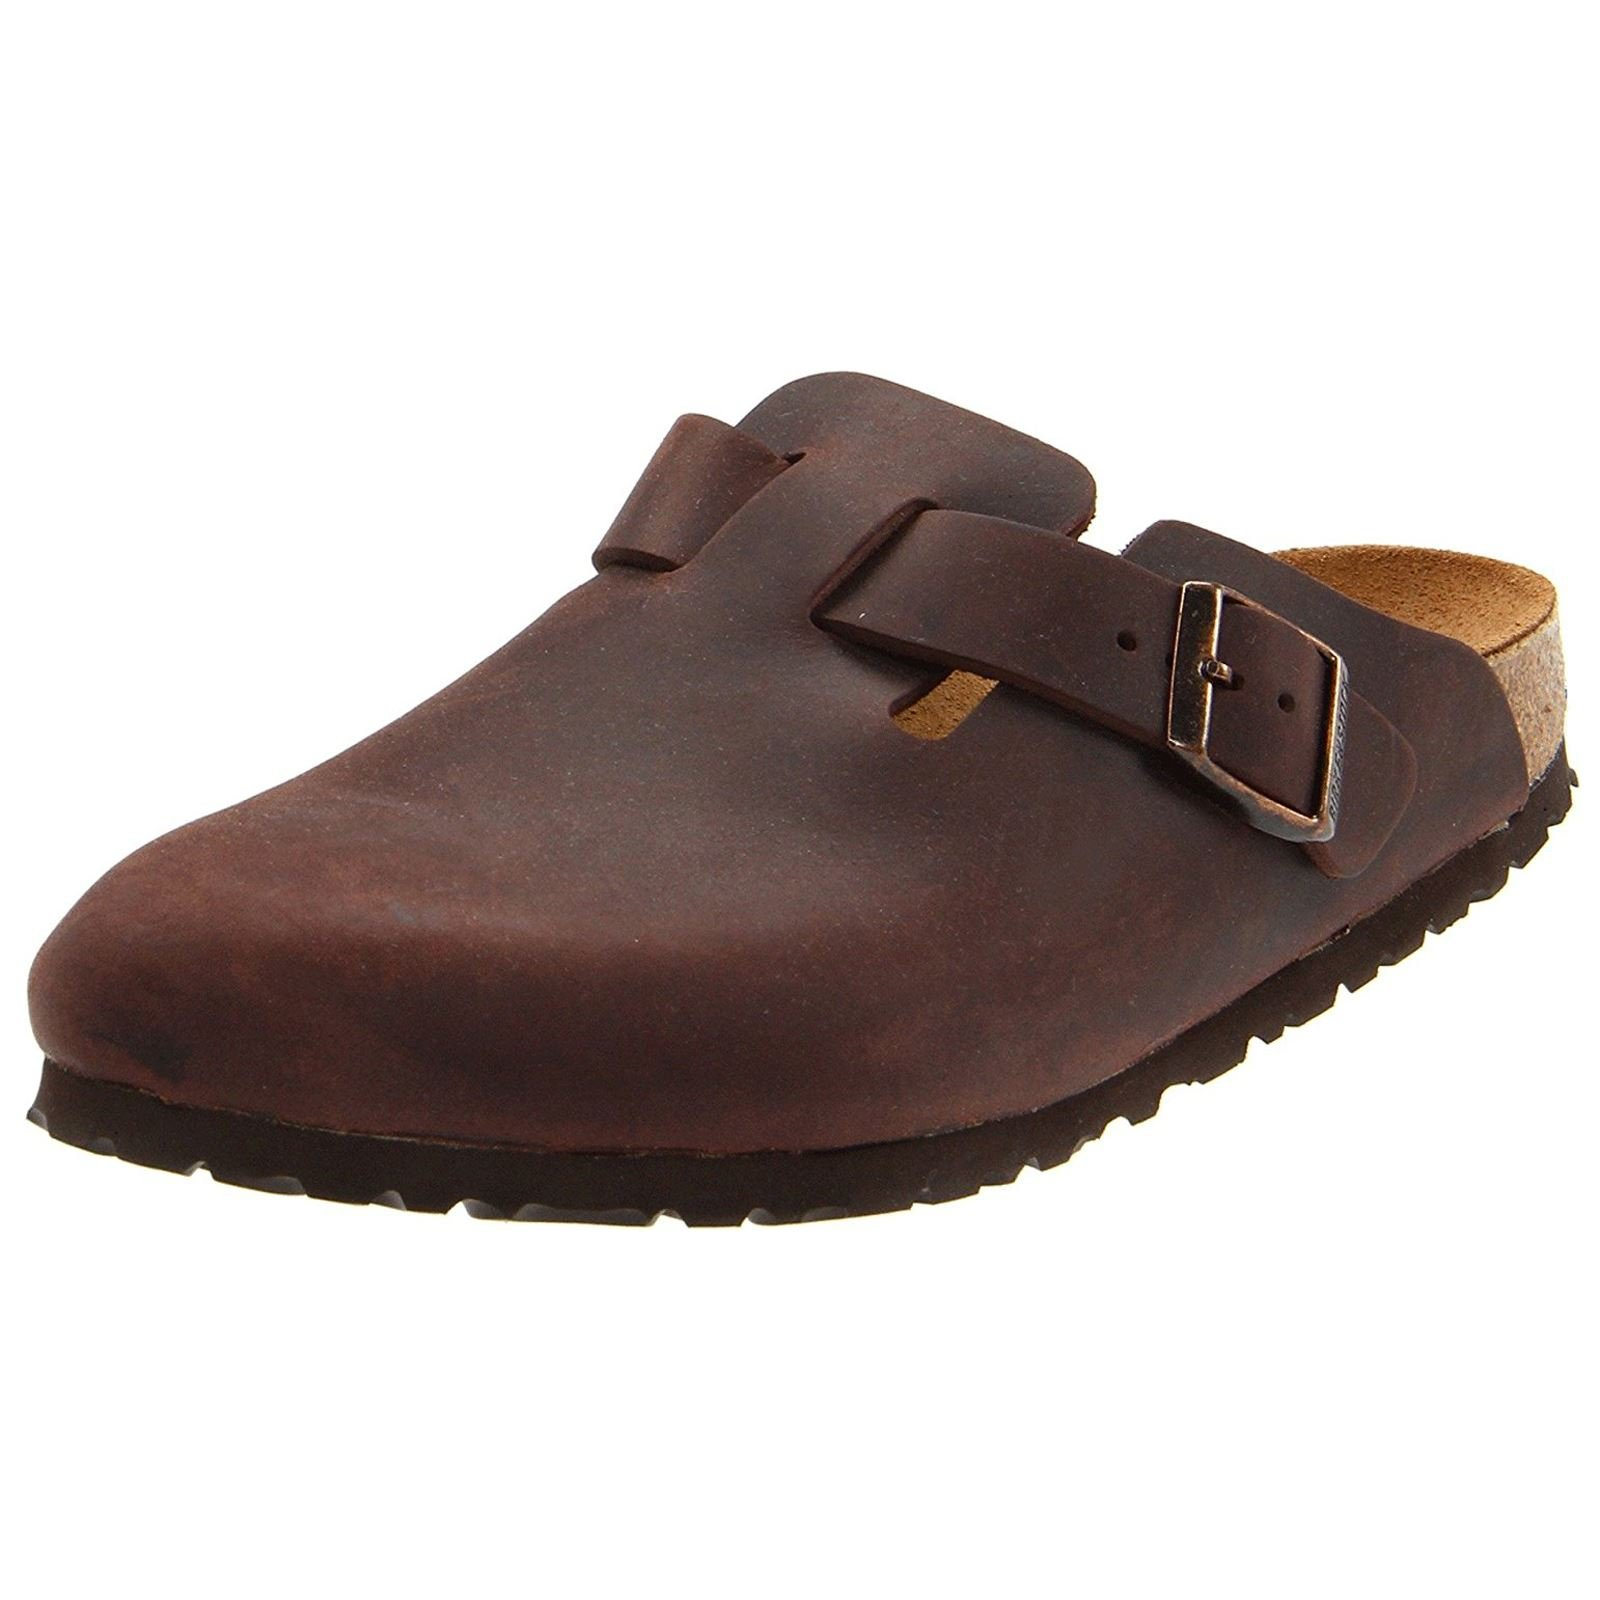 Birkenstock Unisex Boston Clog,Habana Oiled Leather,41 M EU